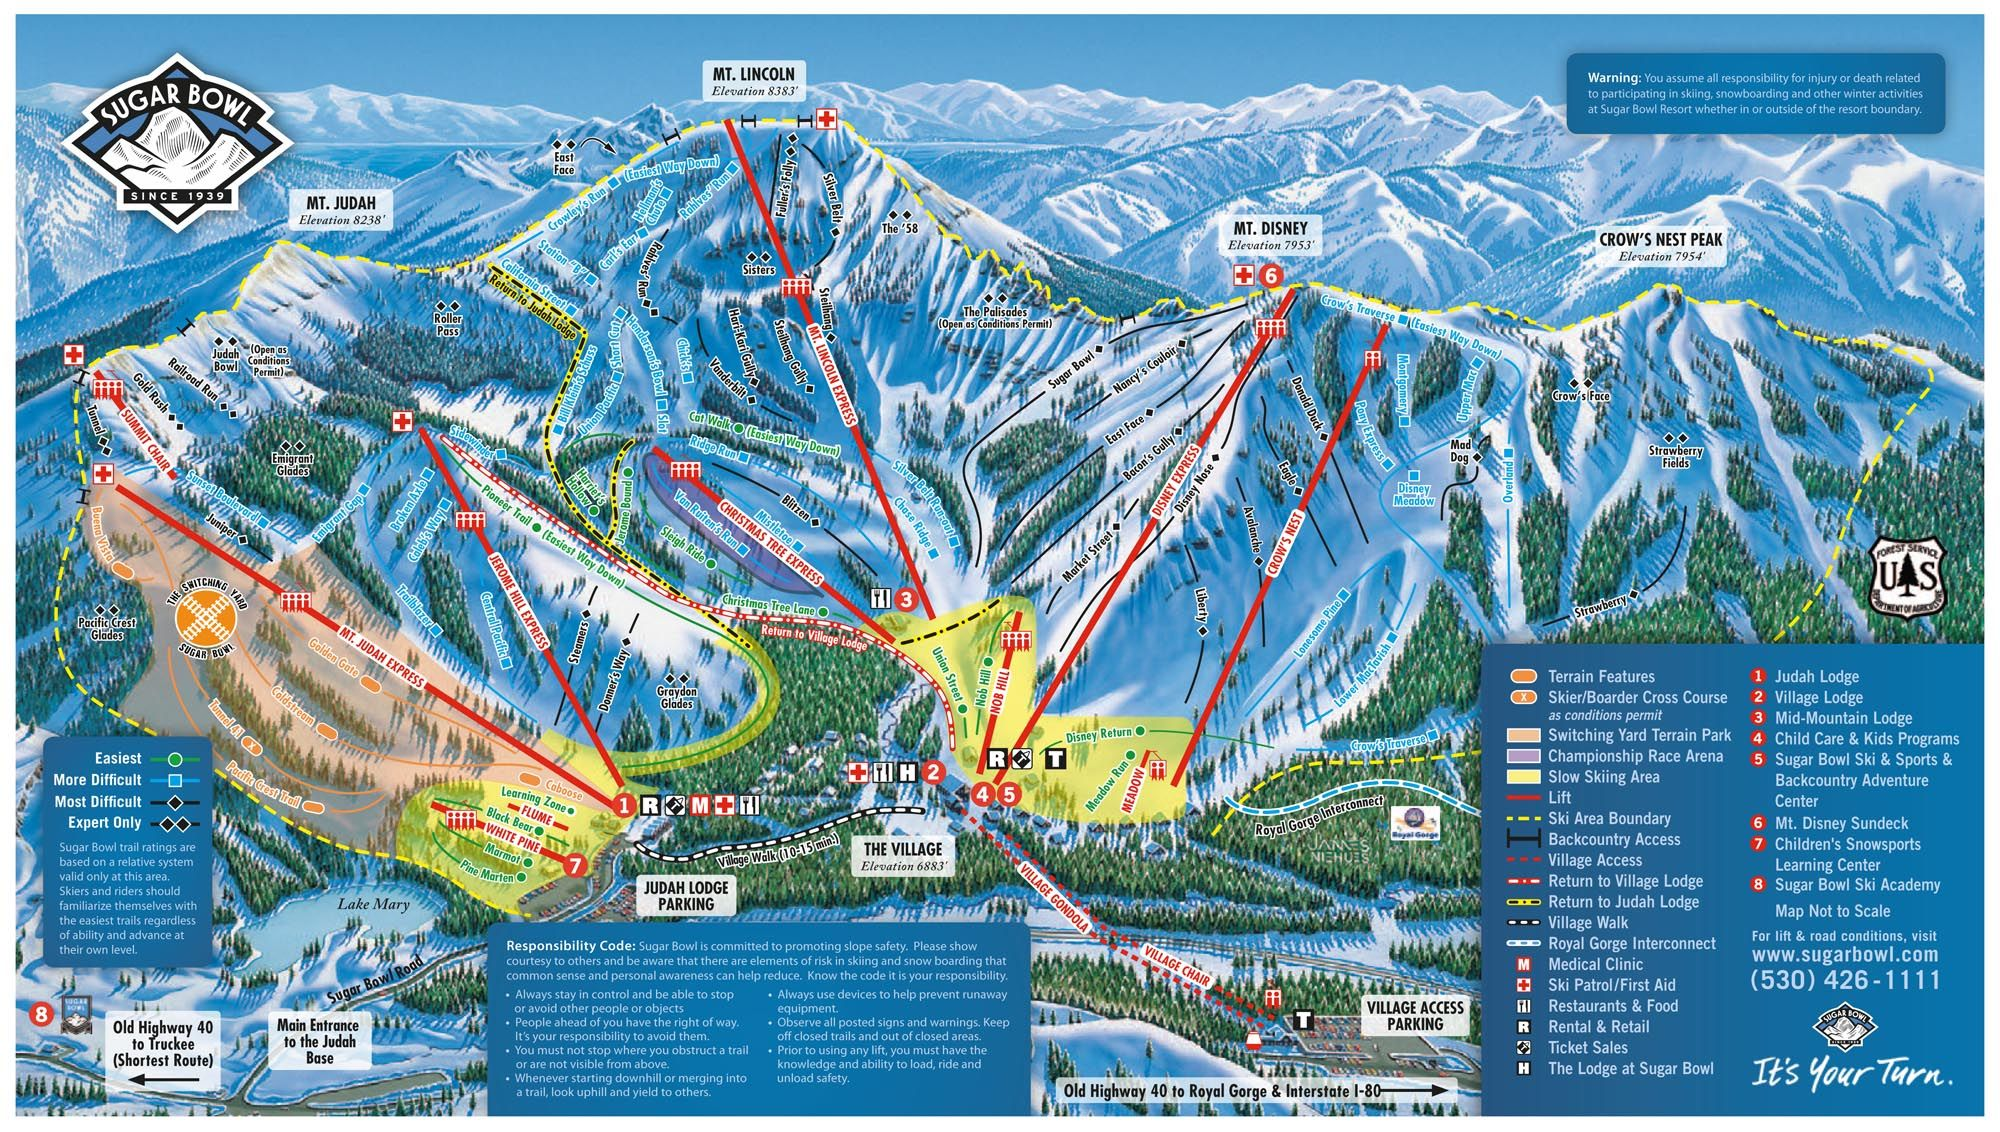 lake tahoe ski resorts: your guide to your winter getaway